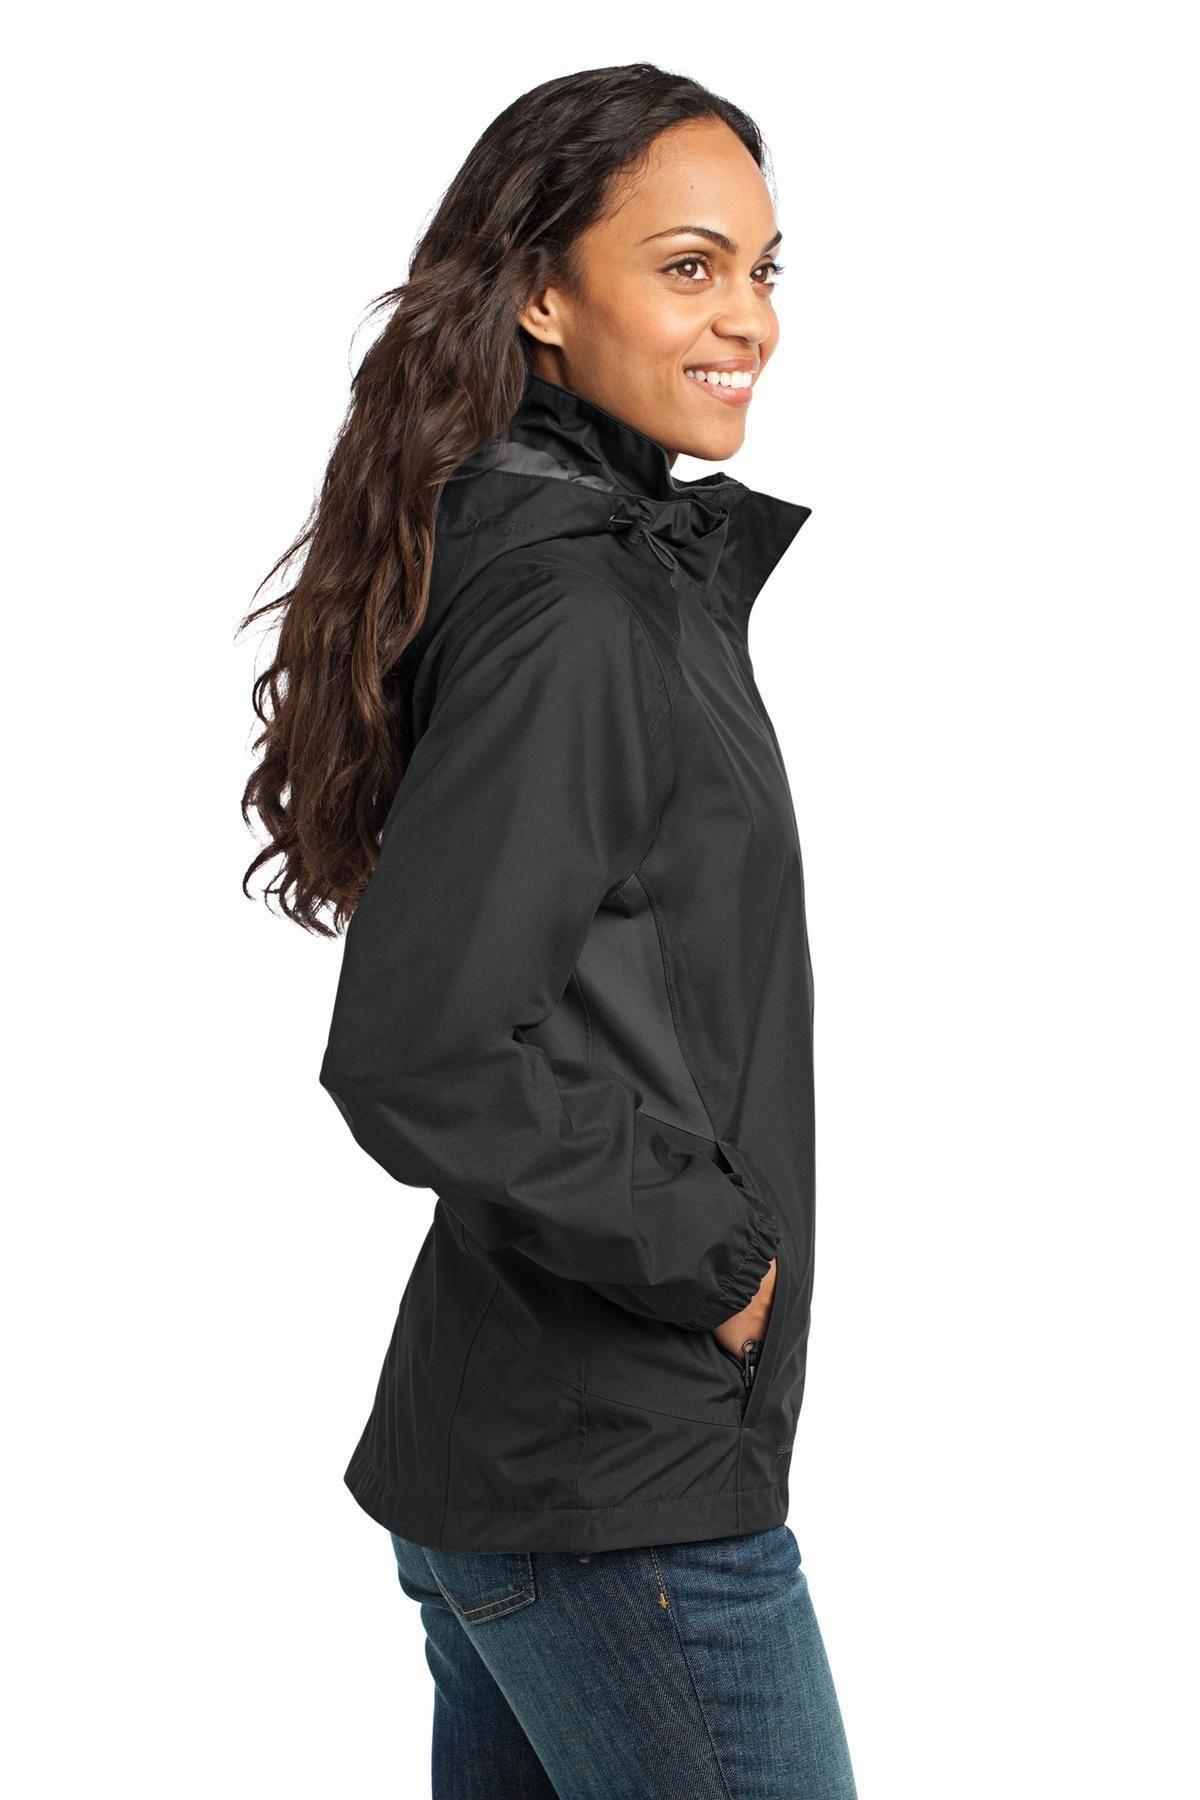 8beef9ca934d Eddie Bauer - Ladies Rain Jacket EB551 Black Steel Grey   ColumbiaRainJacketWomensgreen